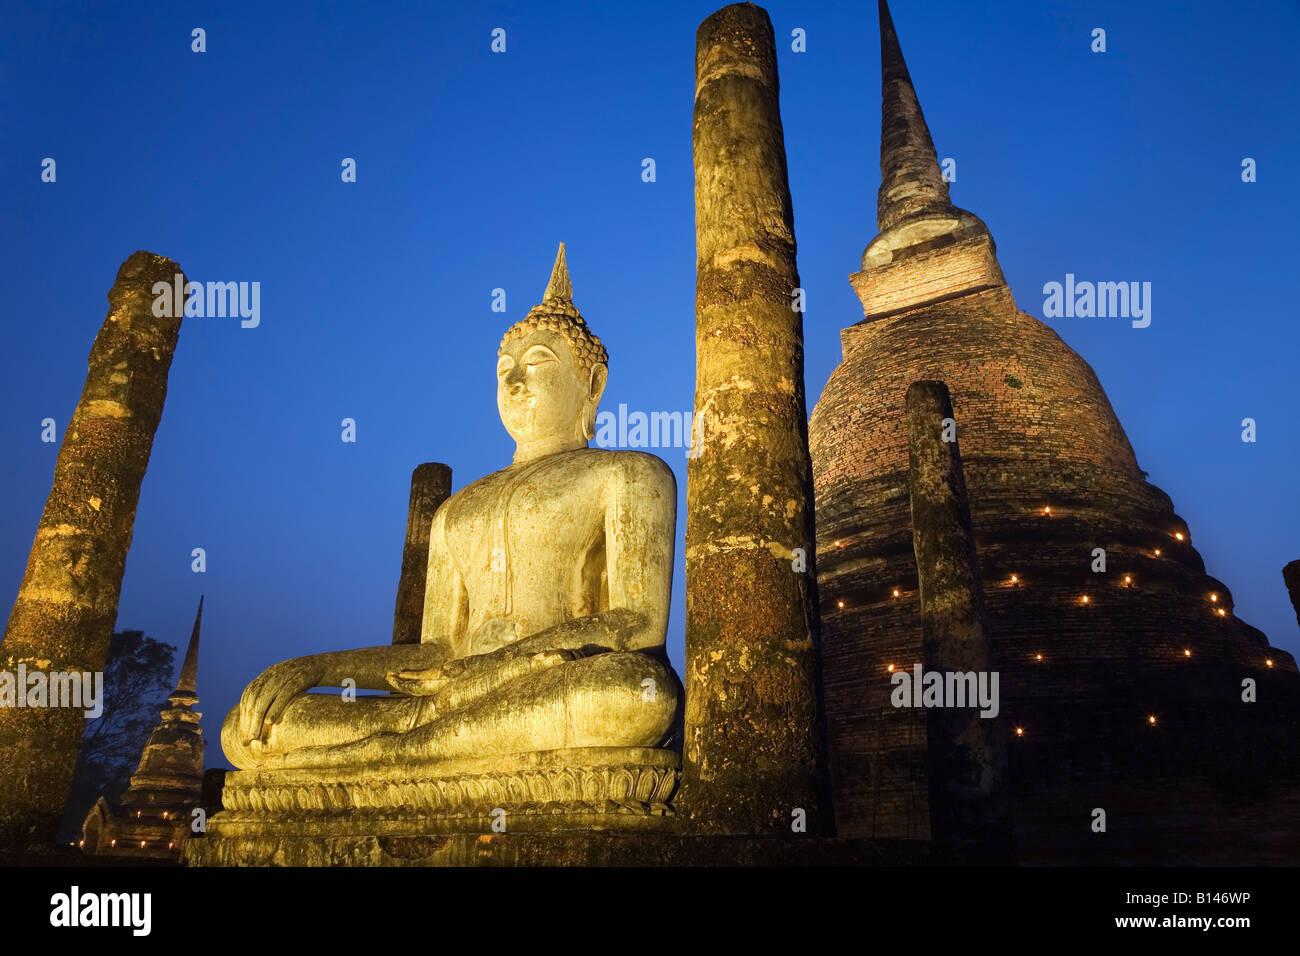 Wat Sa Si - Sukhothai, Sukhothai province, THAILAND - Stock Image